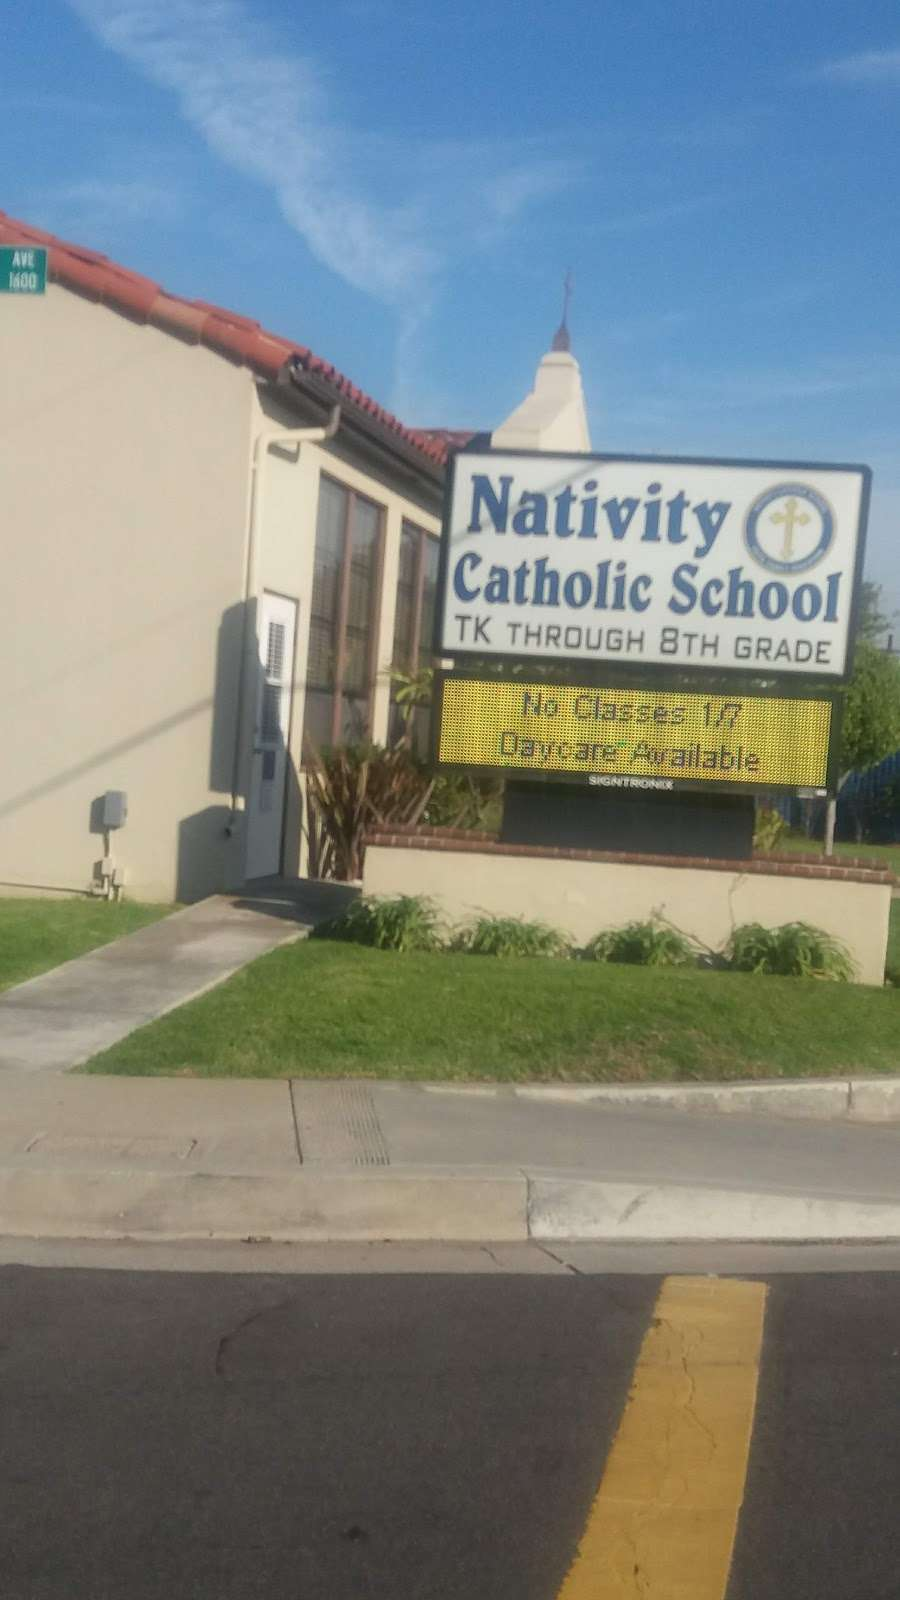 Nativity Catholic School - school    Photo 1 of 1   Address: 2371 W Carson St, Torrance, CA 90501, USA   Phone: (310) 328-5387